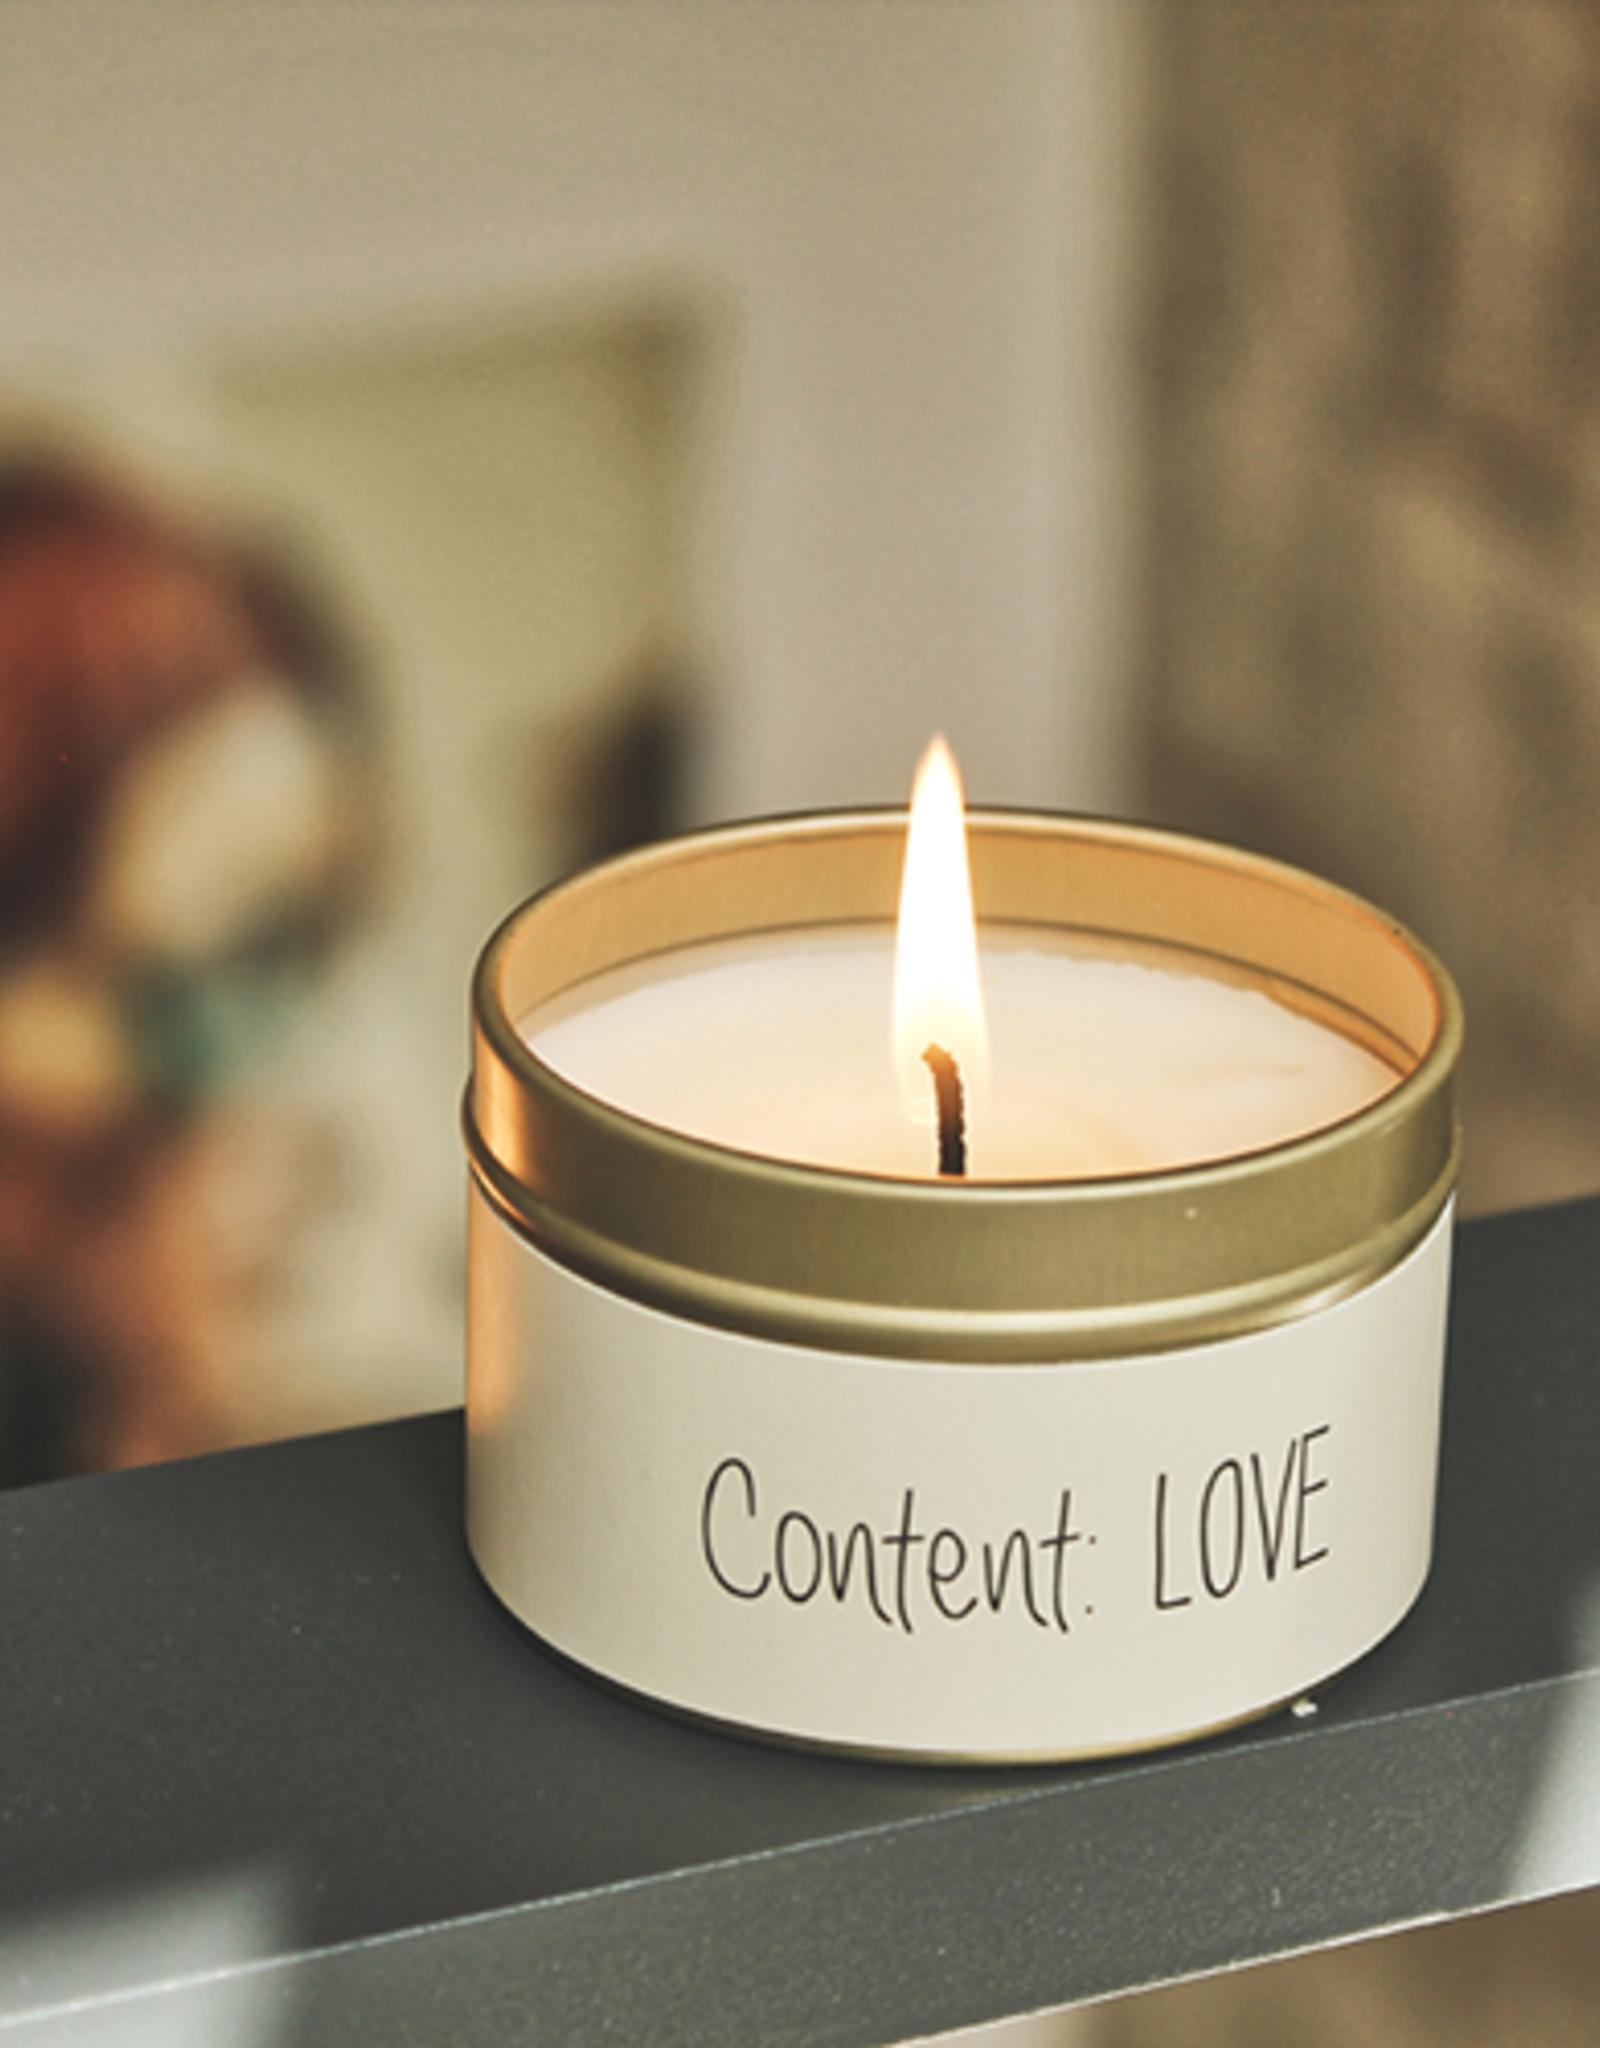 Sojakaars XS - CONTENT: LOVE - Geur: FRESH COTTON